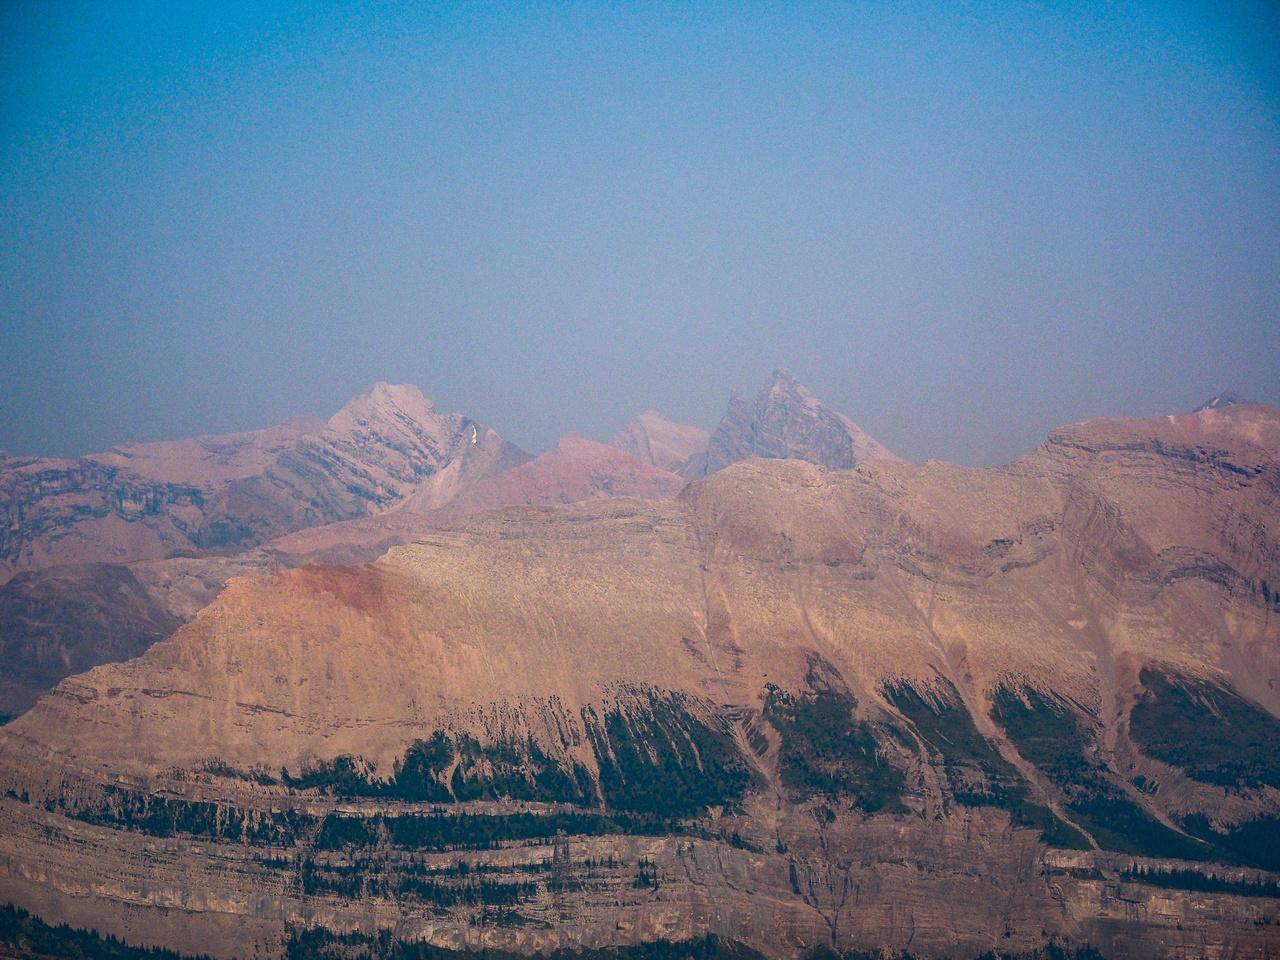 Looking over the NW ridge of Kentigern towards Recondite Peak.